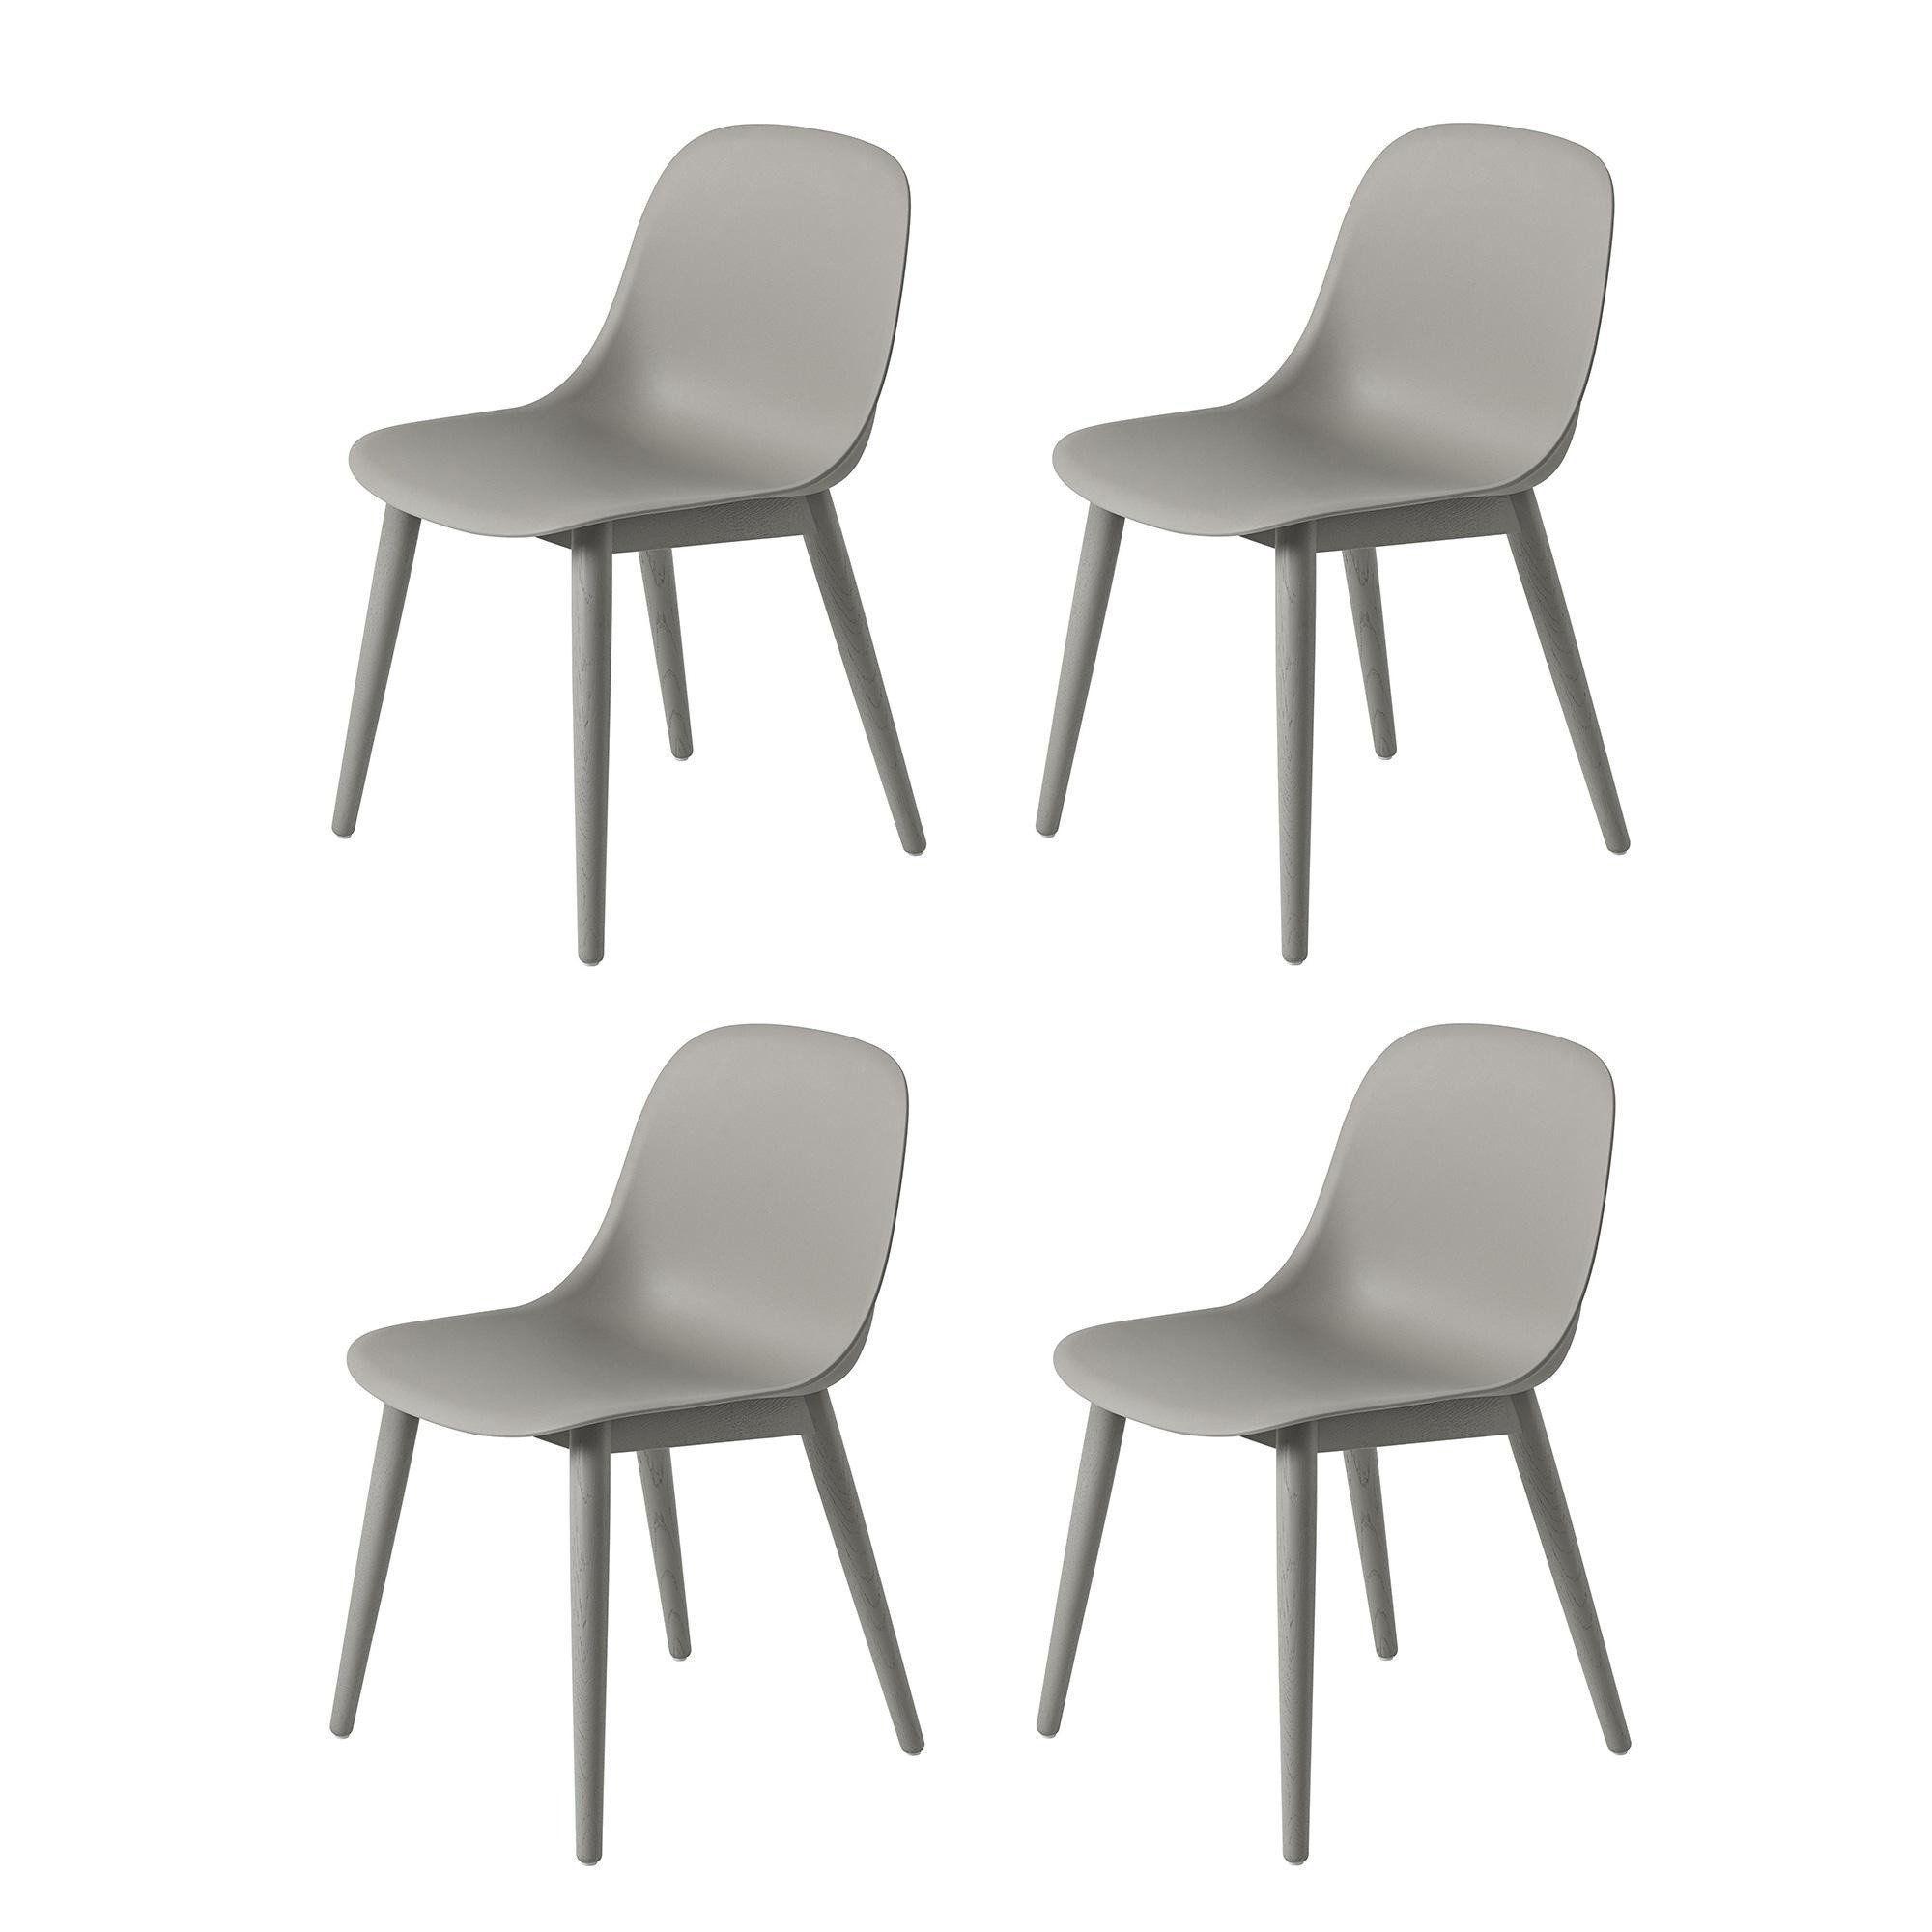 stuhl eiche grau cool stuhl eiche grau with stuhl eiche grau elegant groa with stuhl eiche. Black Bedroom Furniture Sets. Home Design Ideas